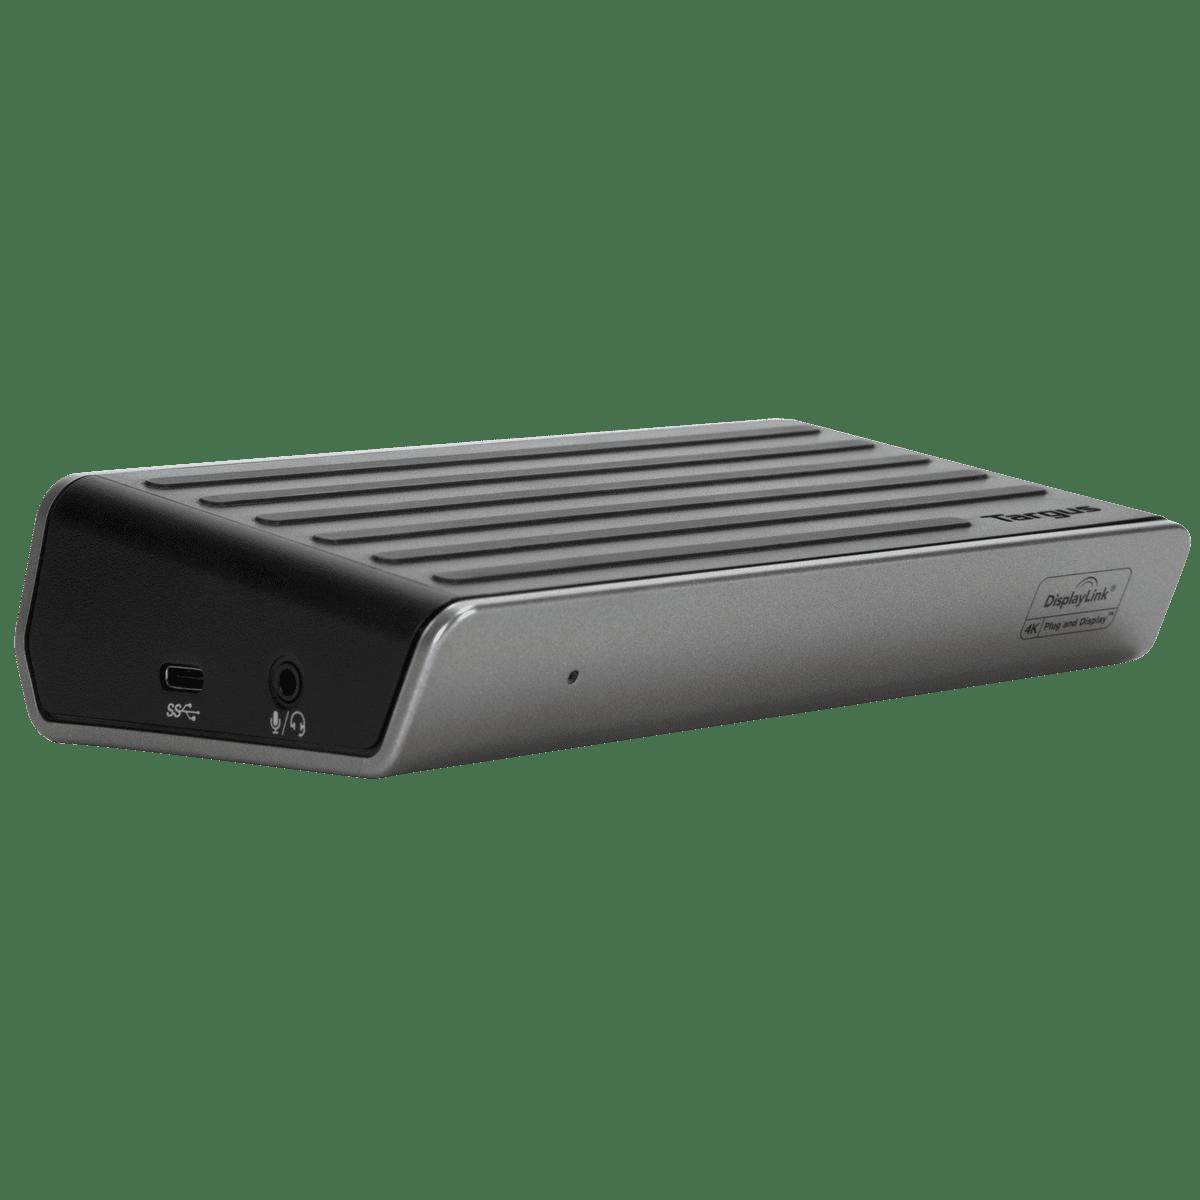 Targus Universal USB 3.0 DV4K Docking Station